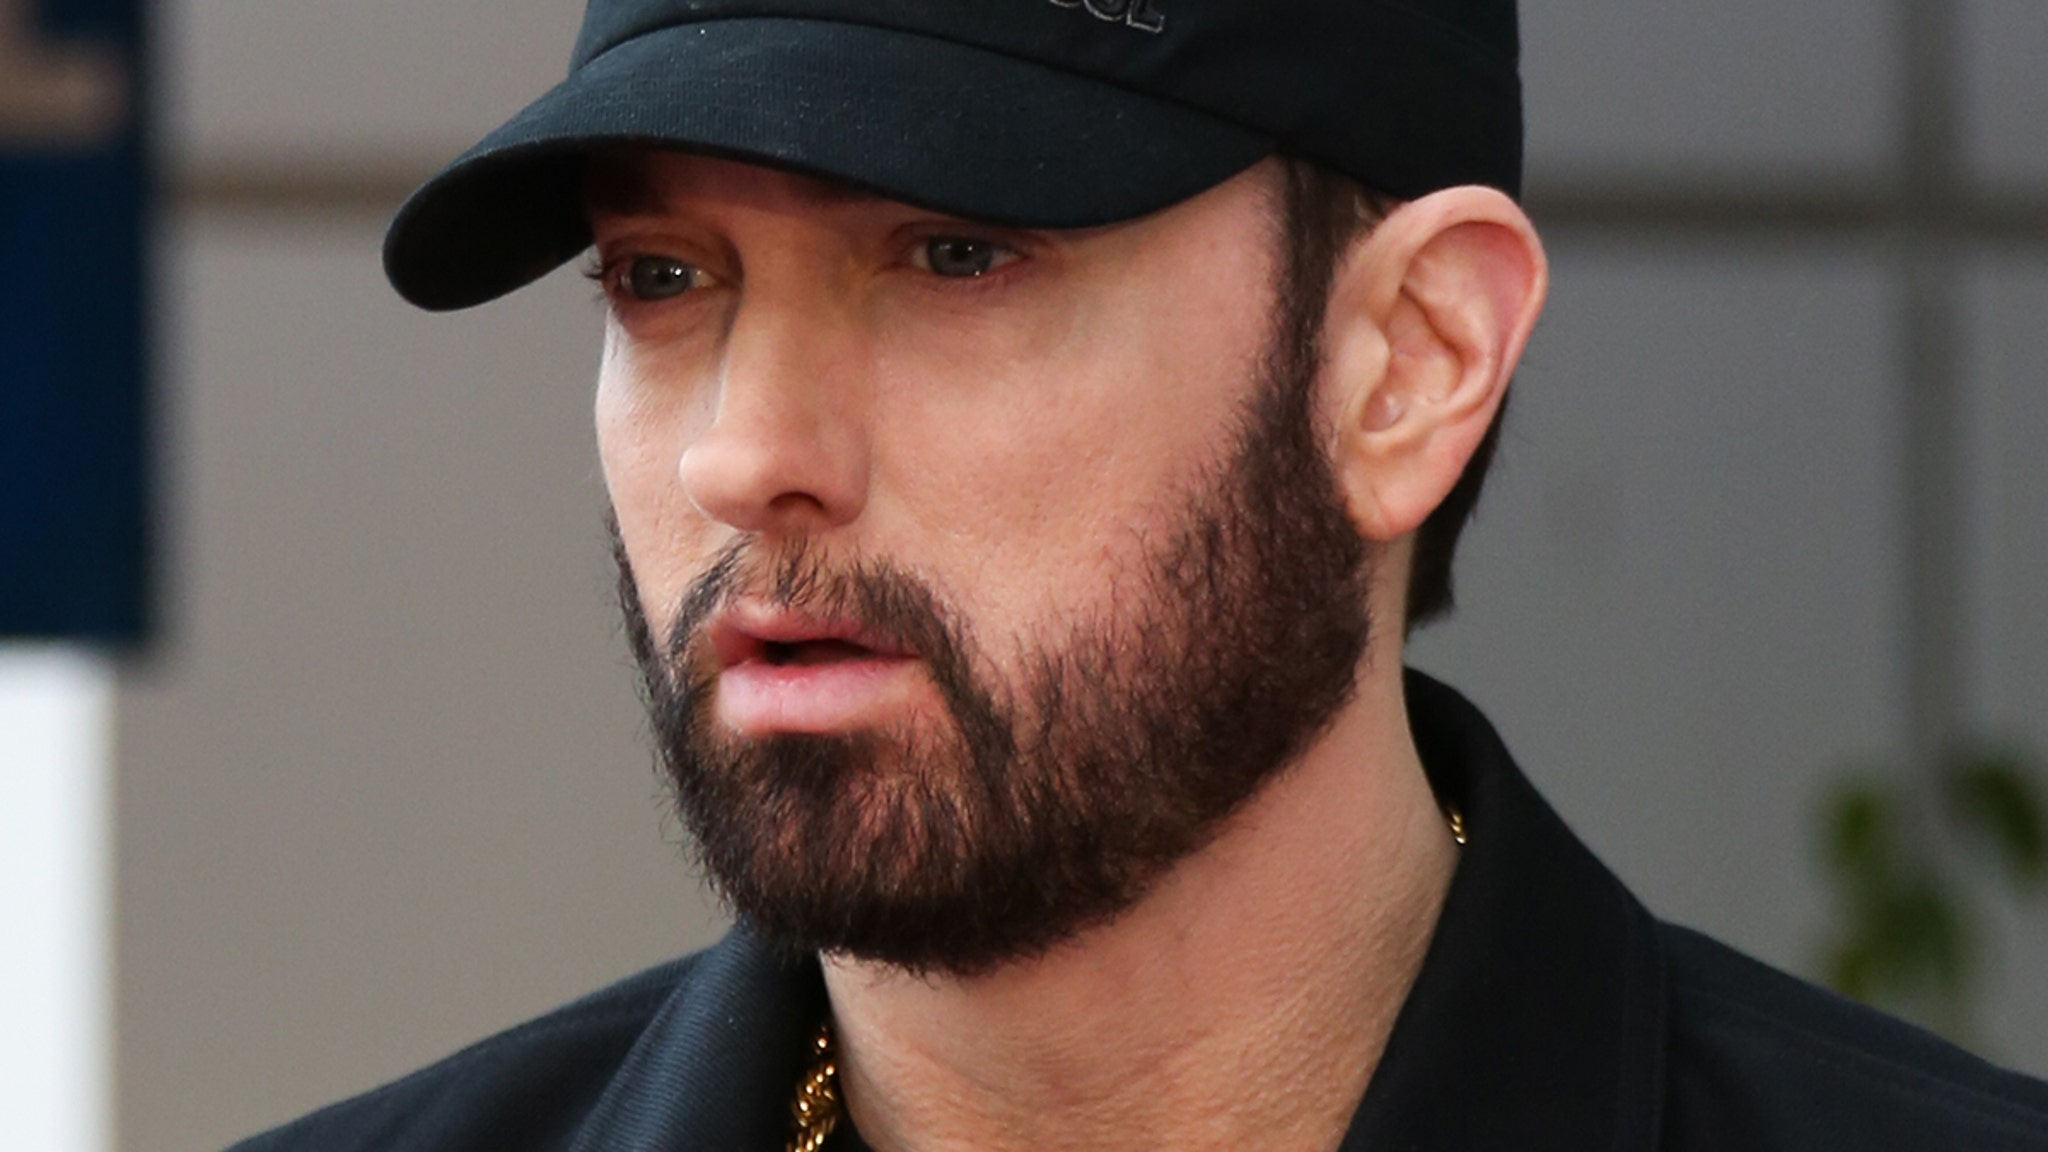 Eminem's Home Intruder Tried Tracking Him Down Last Summer Too - TMZ